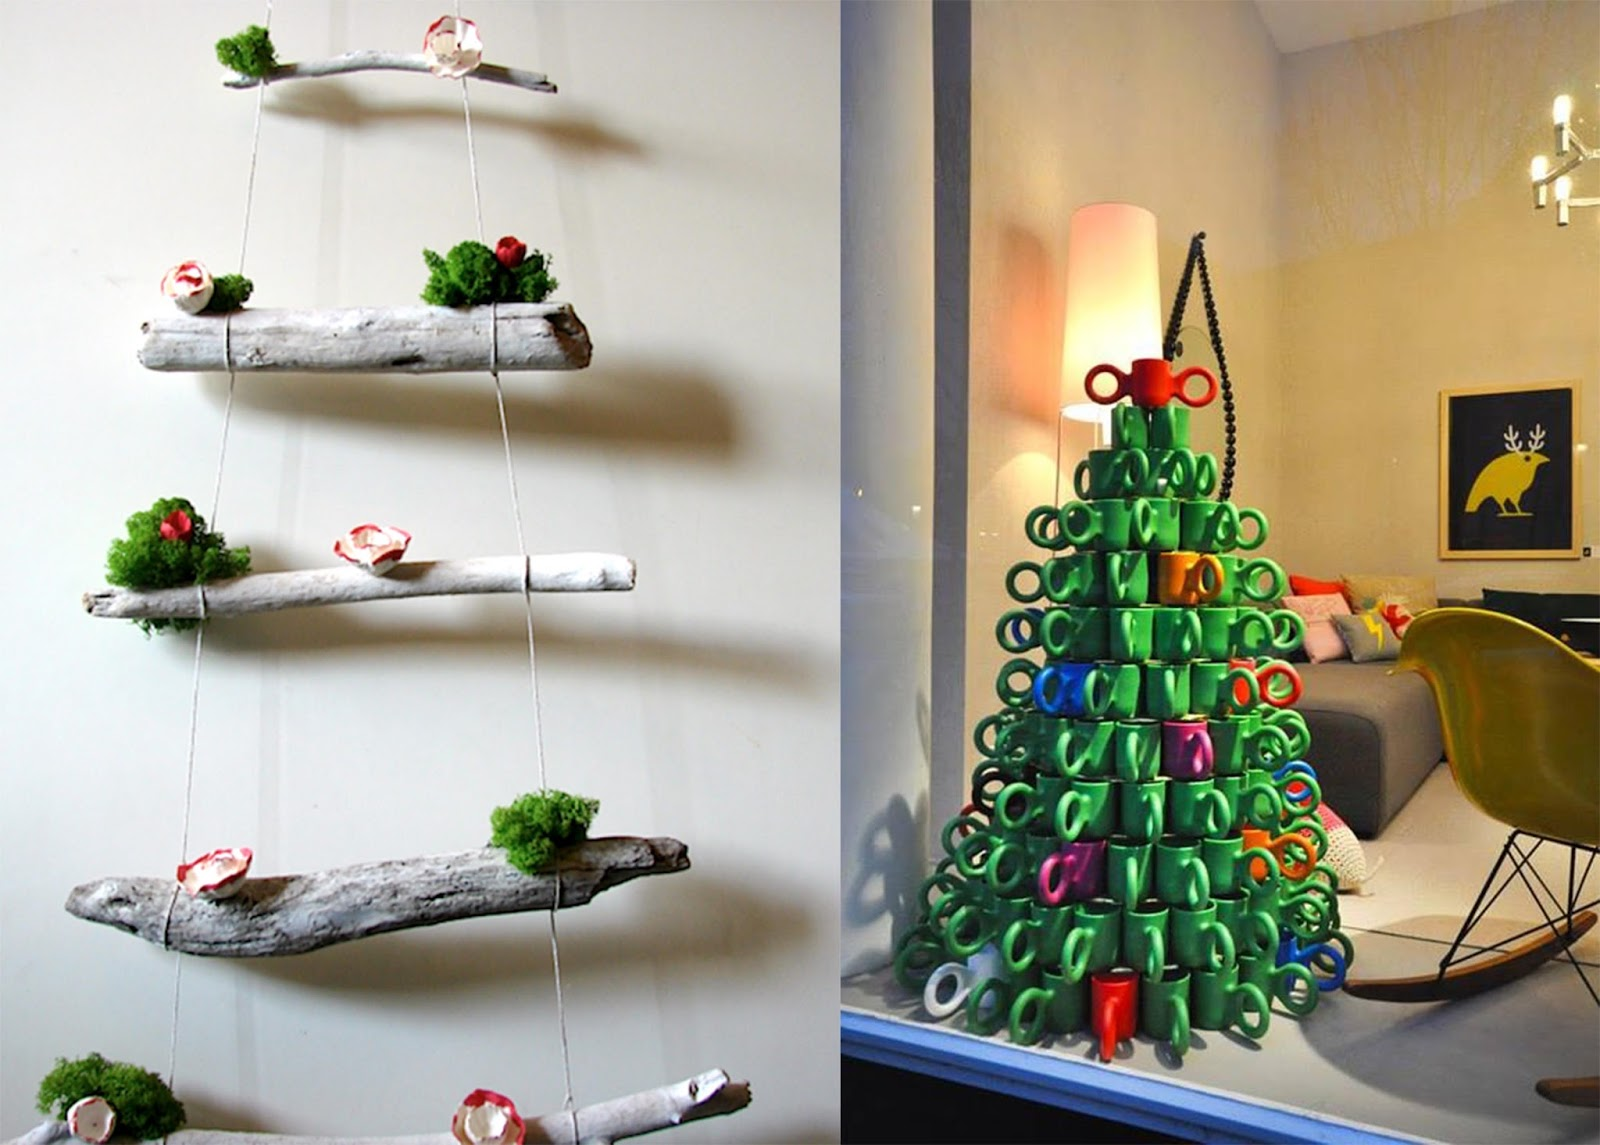 Idee Cucina Per Natale | Idee In Feltro Per Natale Kc02 Regardsdefemmes